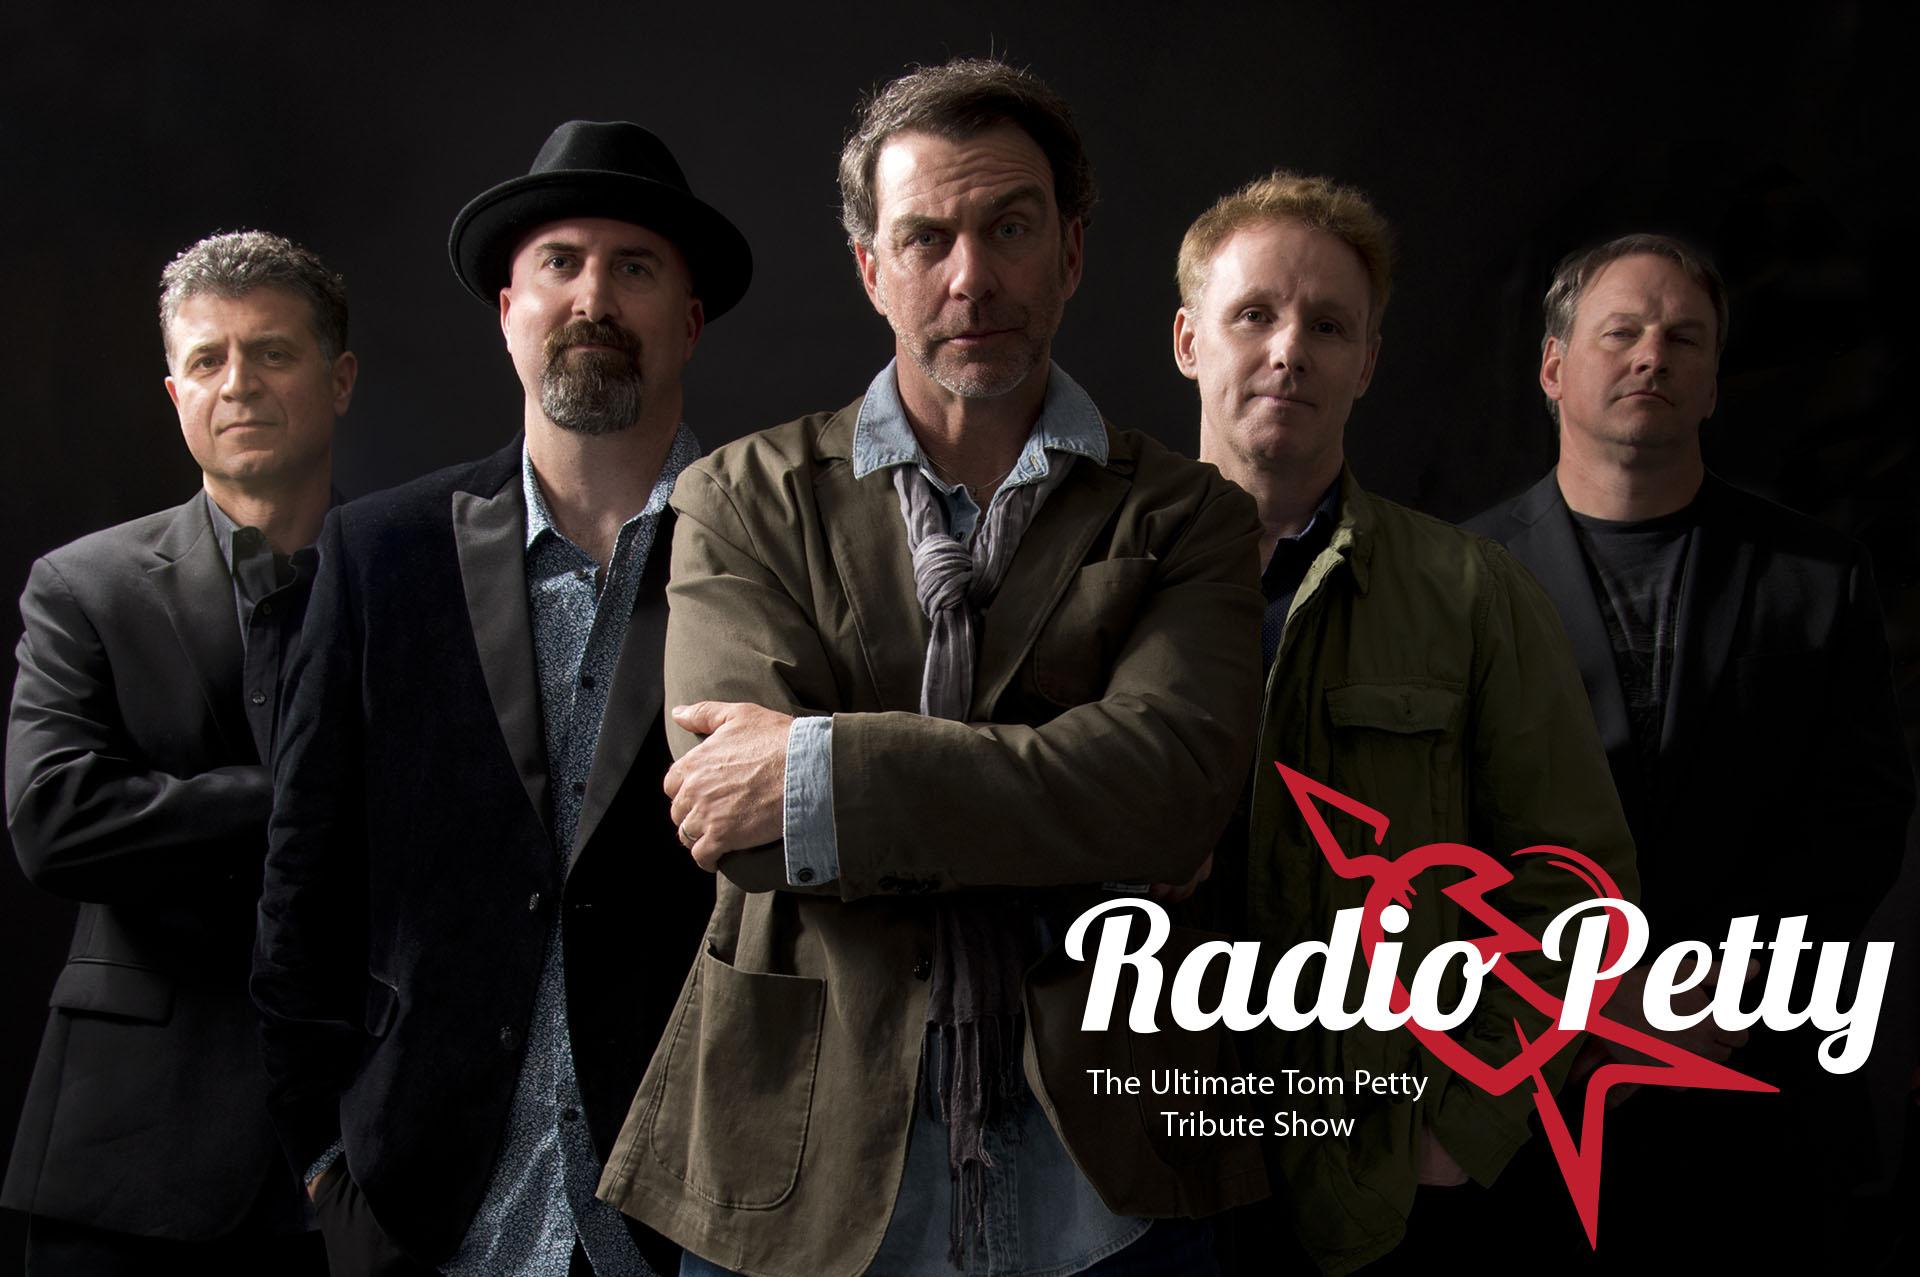 radiopetty-homepage-03